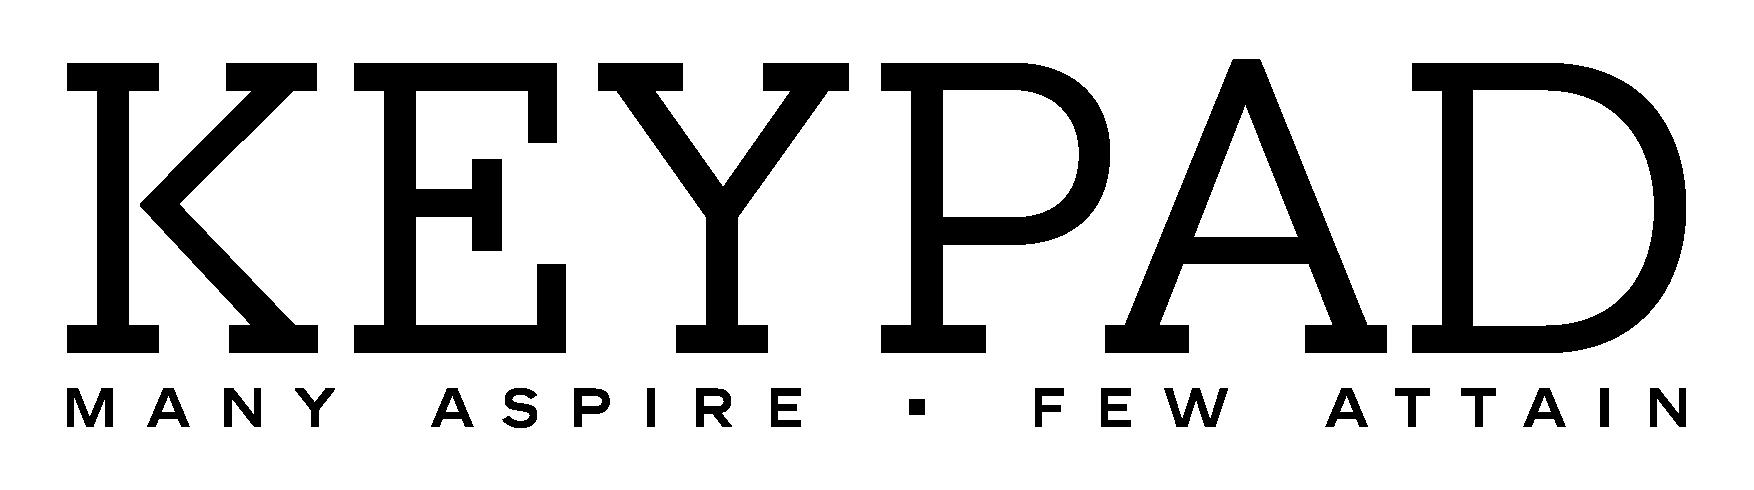 KEYPAD LOGO 2014-01